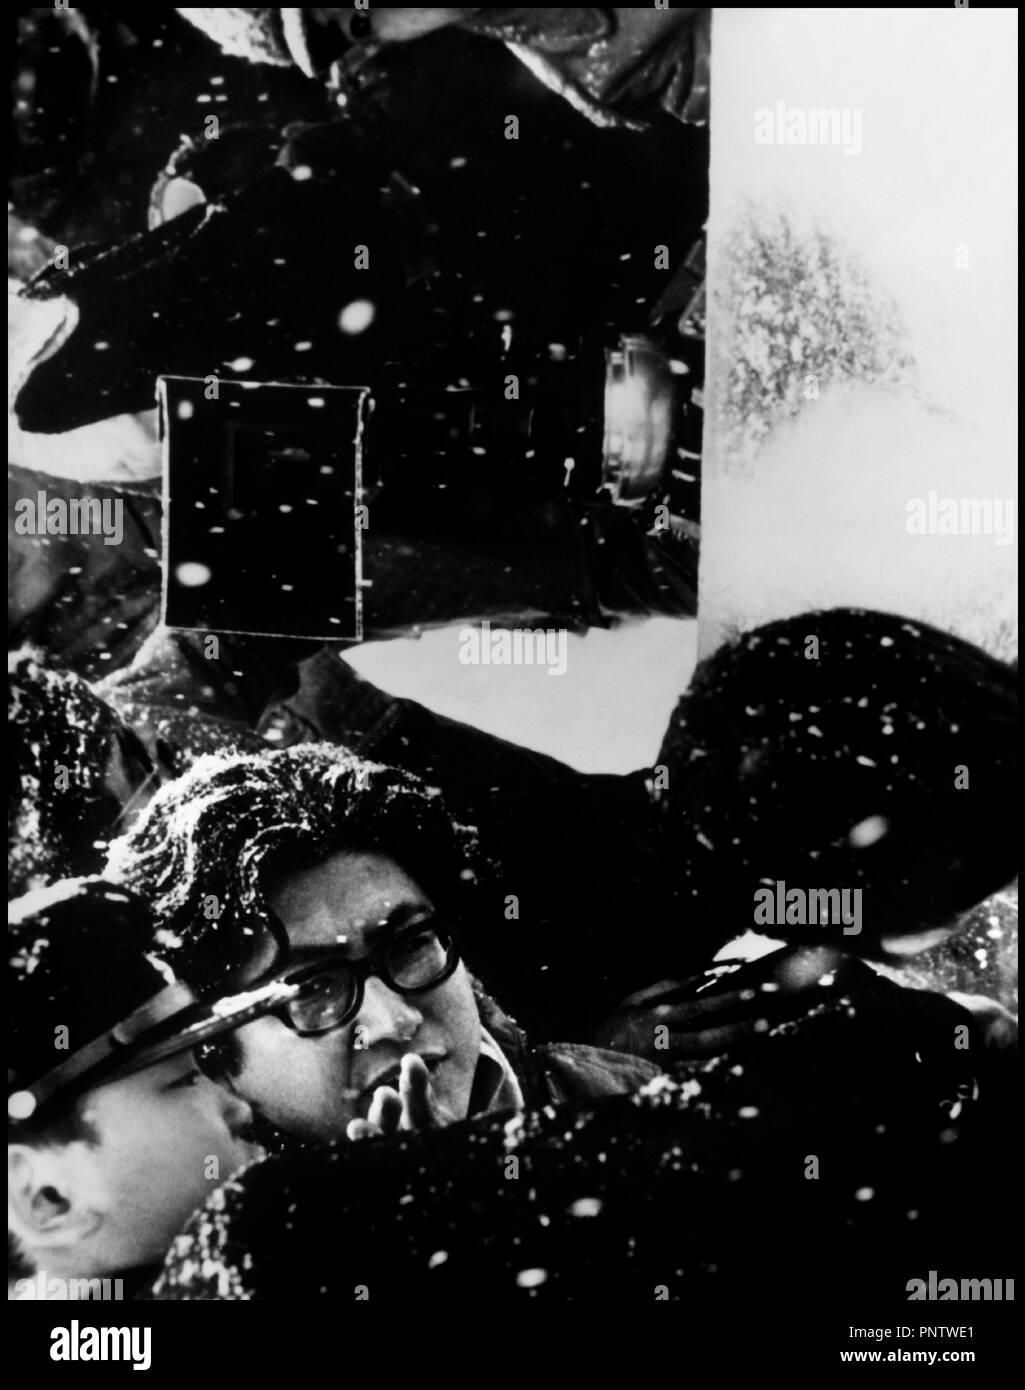 Prod DB © Sozosha - Art Theatre Guild / DR LE PETIT GARCON (SHONEN) de Nagisa Oshima 1969 JAP. avec Tetsuo Abe et Nagisa Oshima sur le tournage autre titre: BOY (titre international) - Stock Image